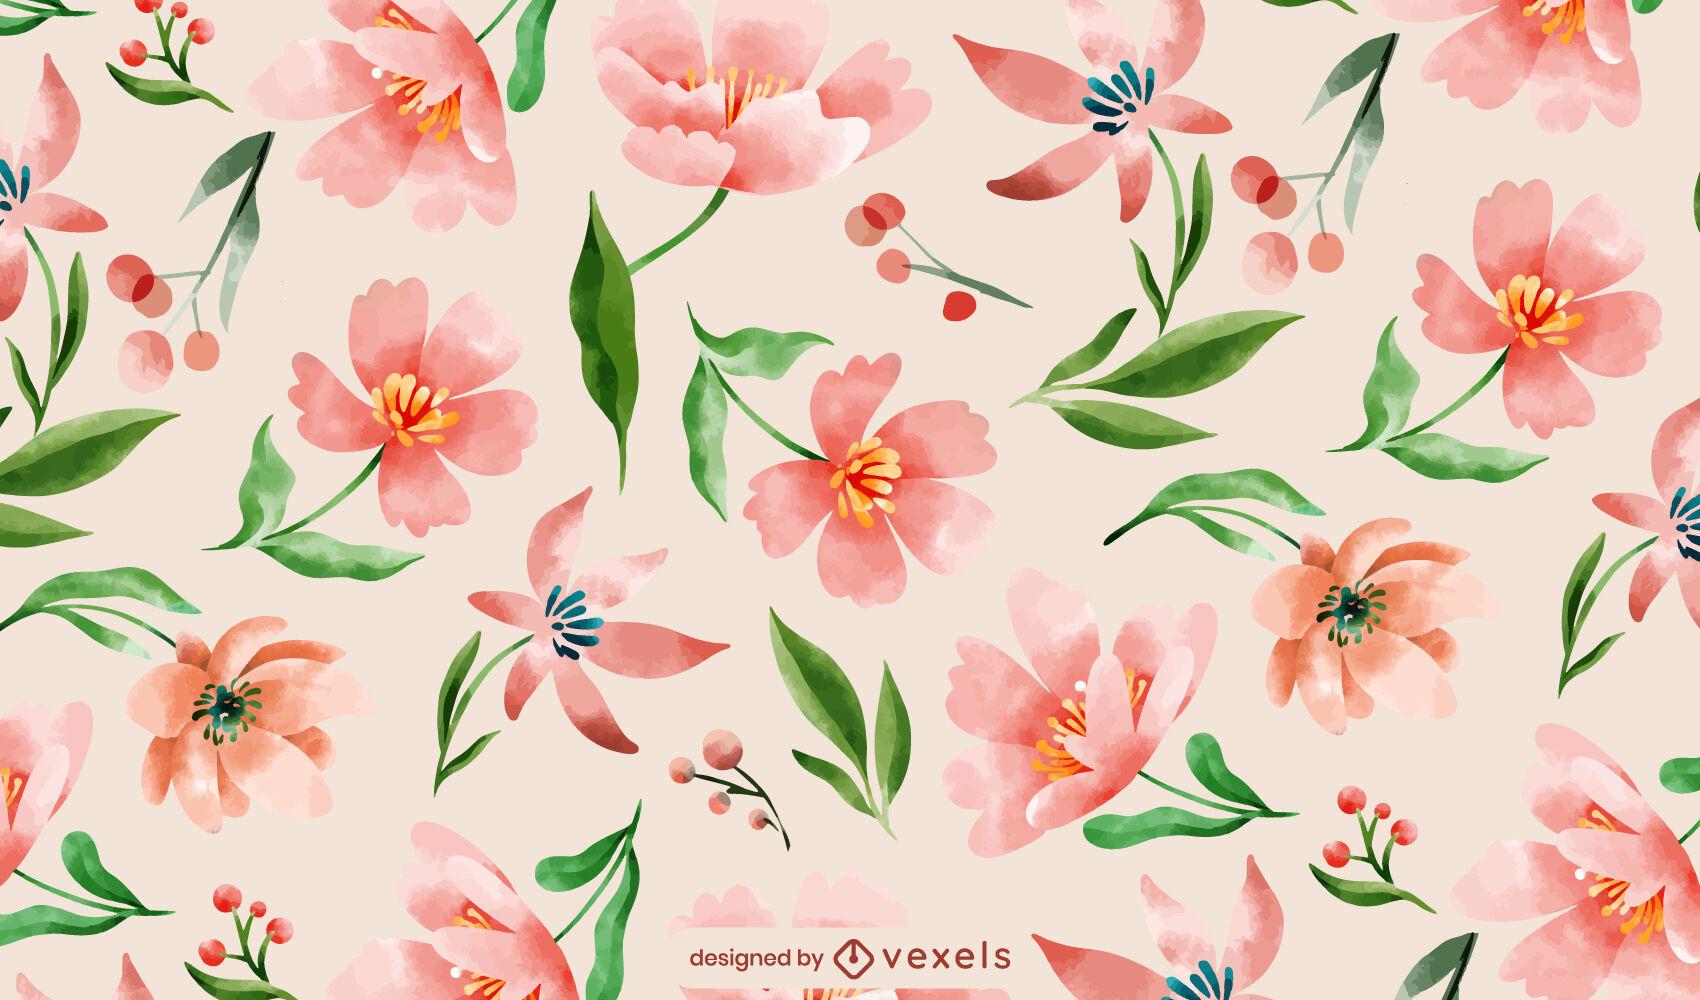 Watercolor pink flowers pattern design